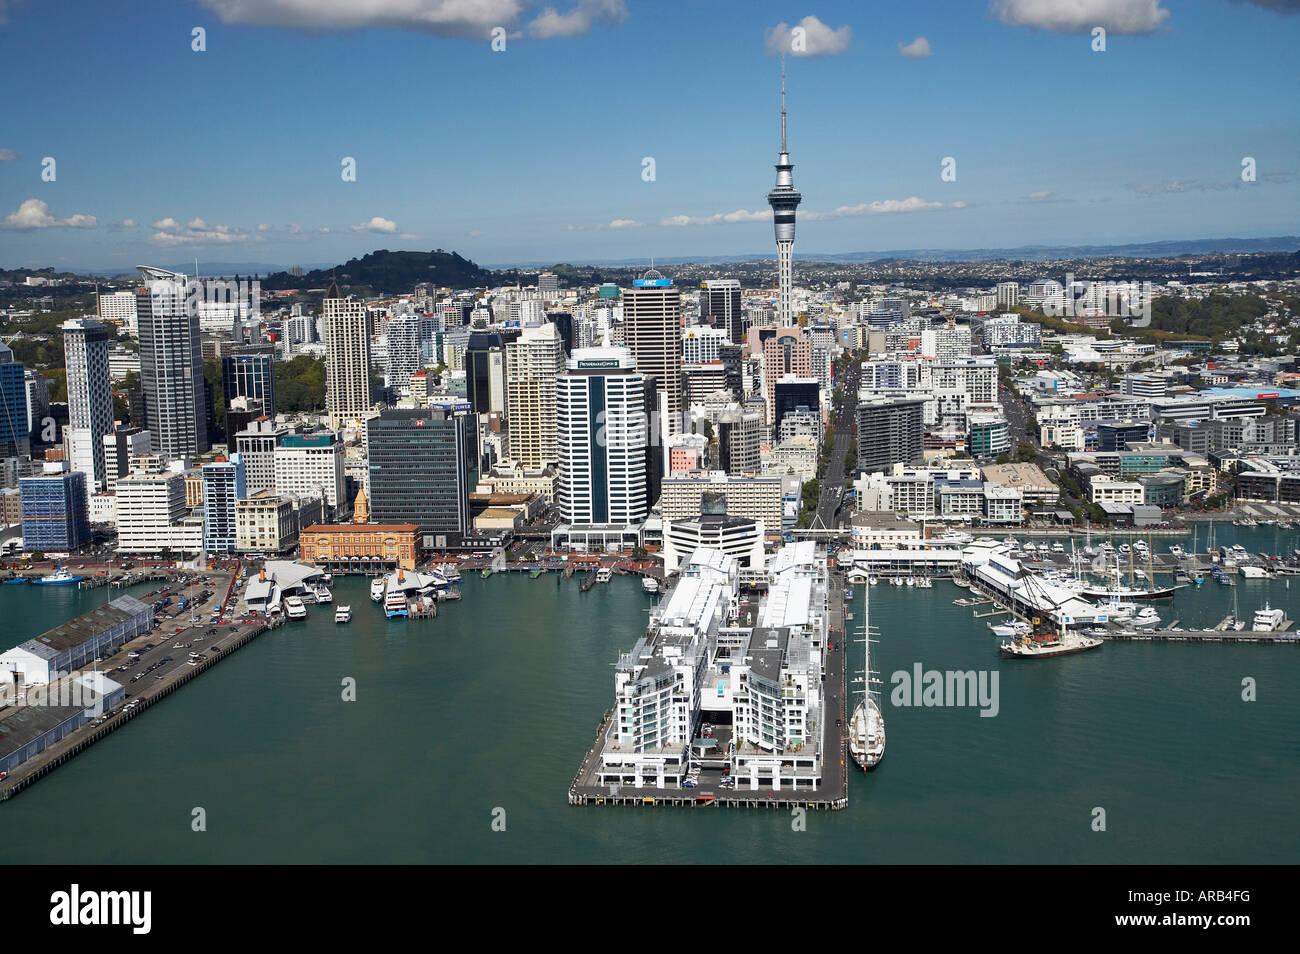 Hilton Hotels In North Island New Zealand